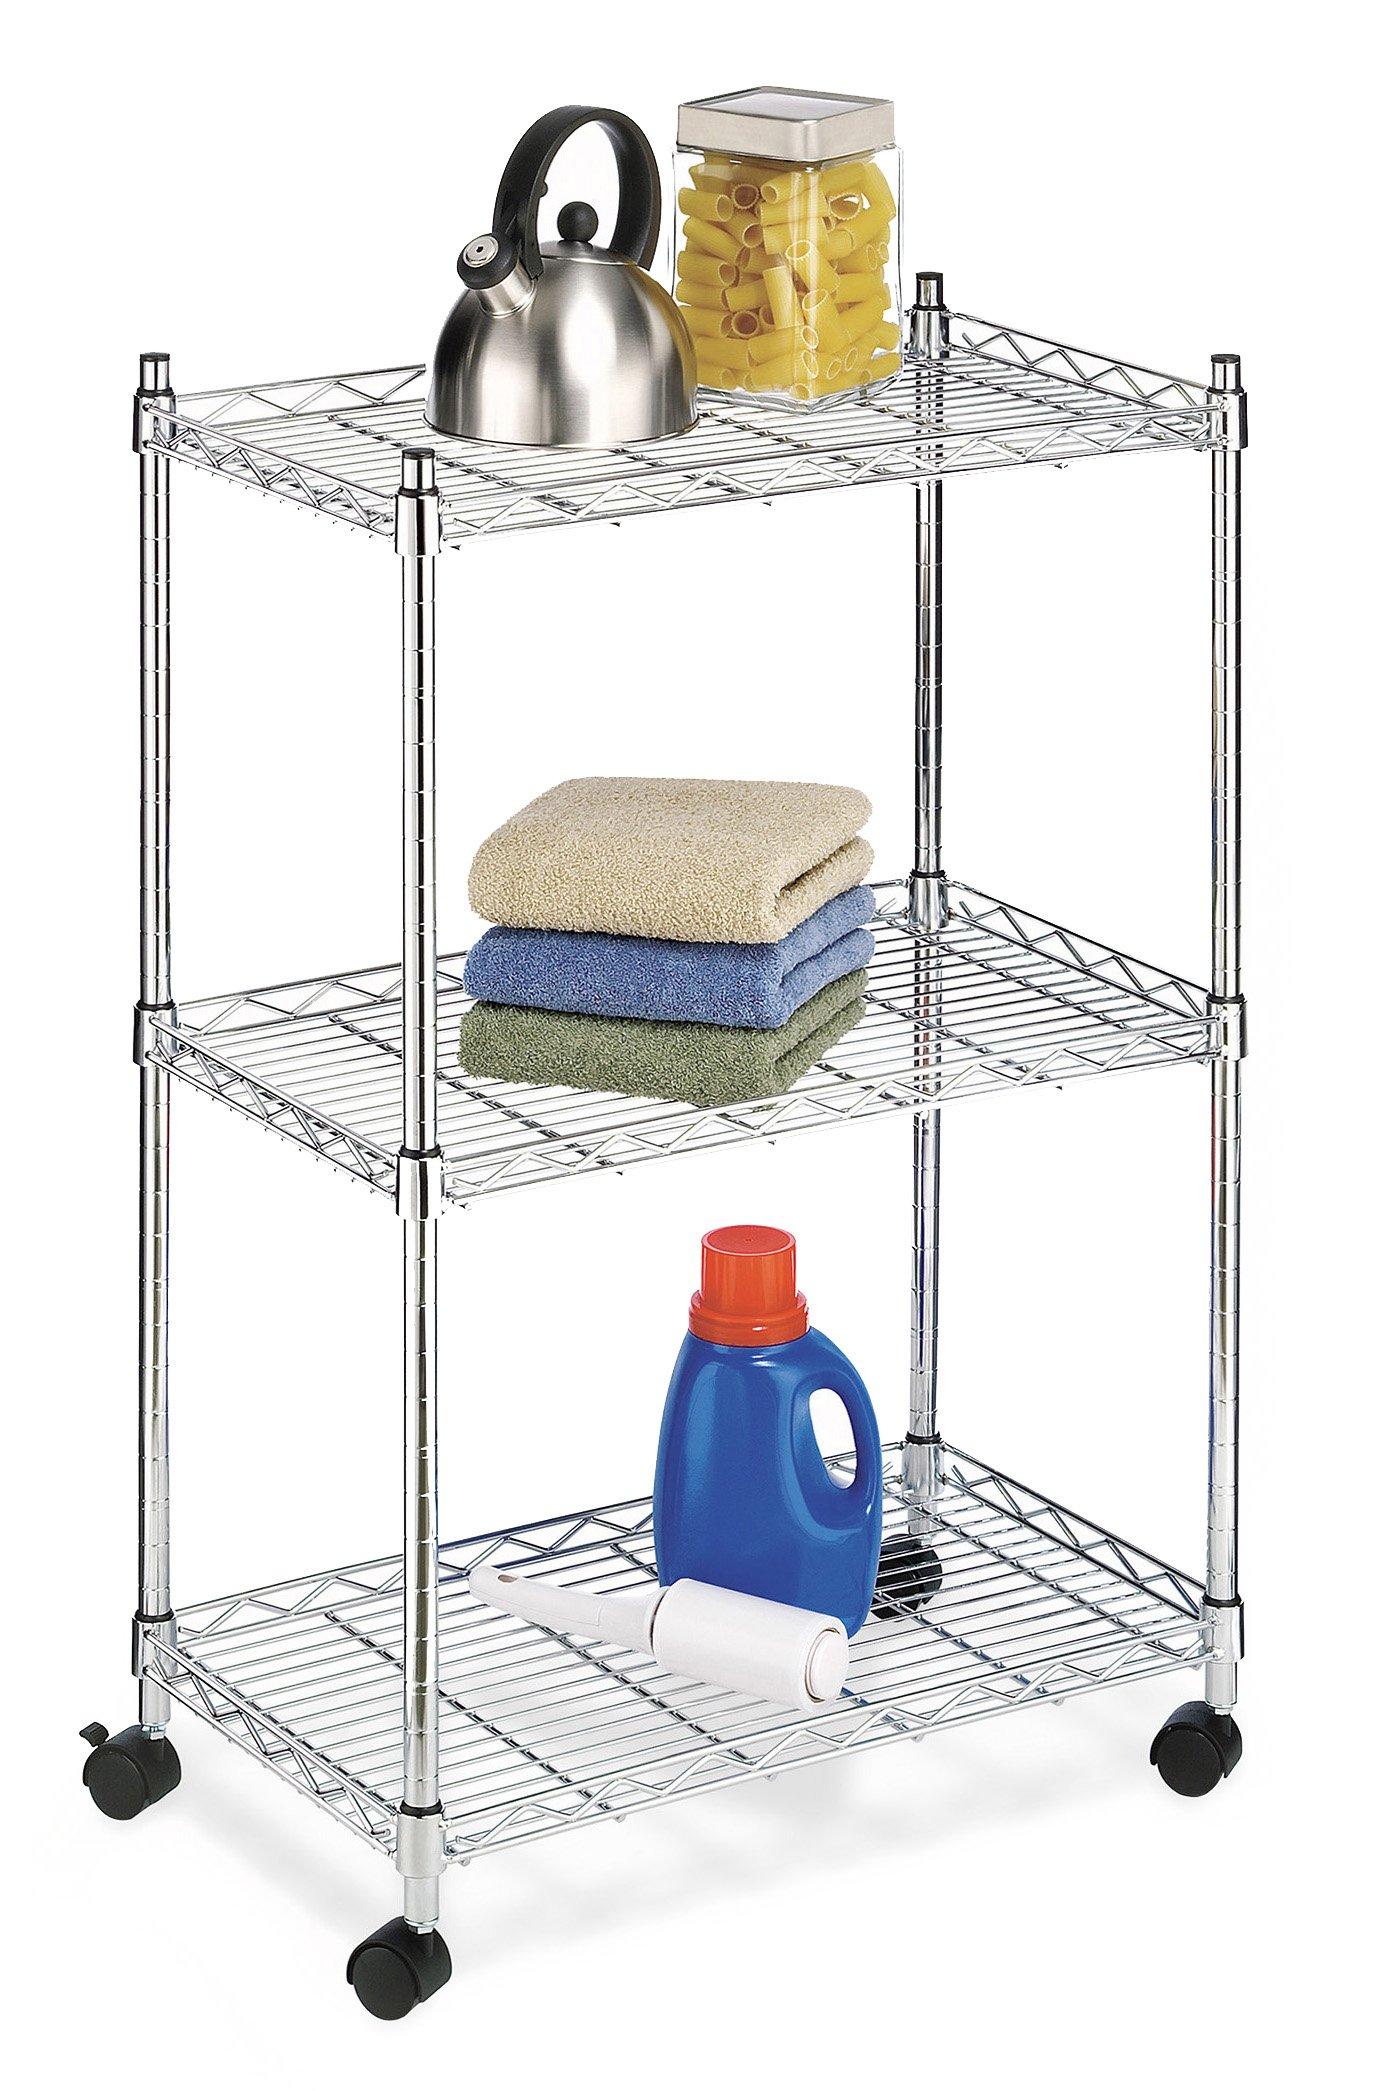 Whitmor 6056-344-N Supreme 3 Tier Cart - Rolling Utility Organizer - Chrome